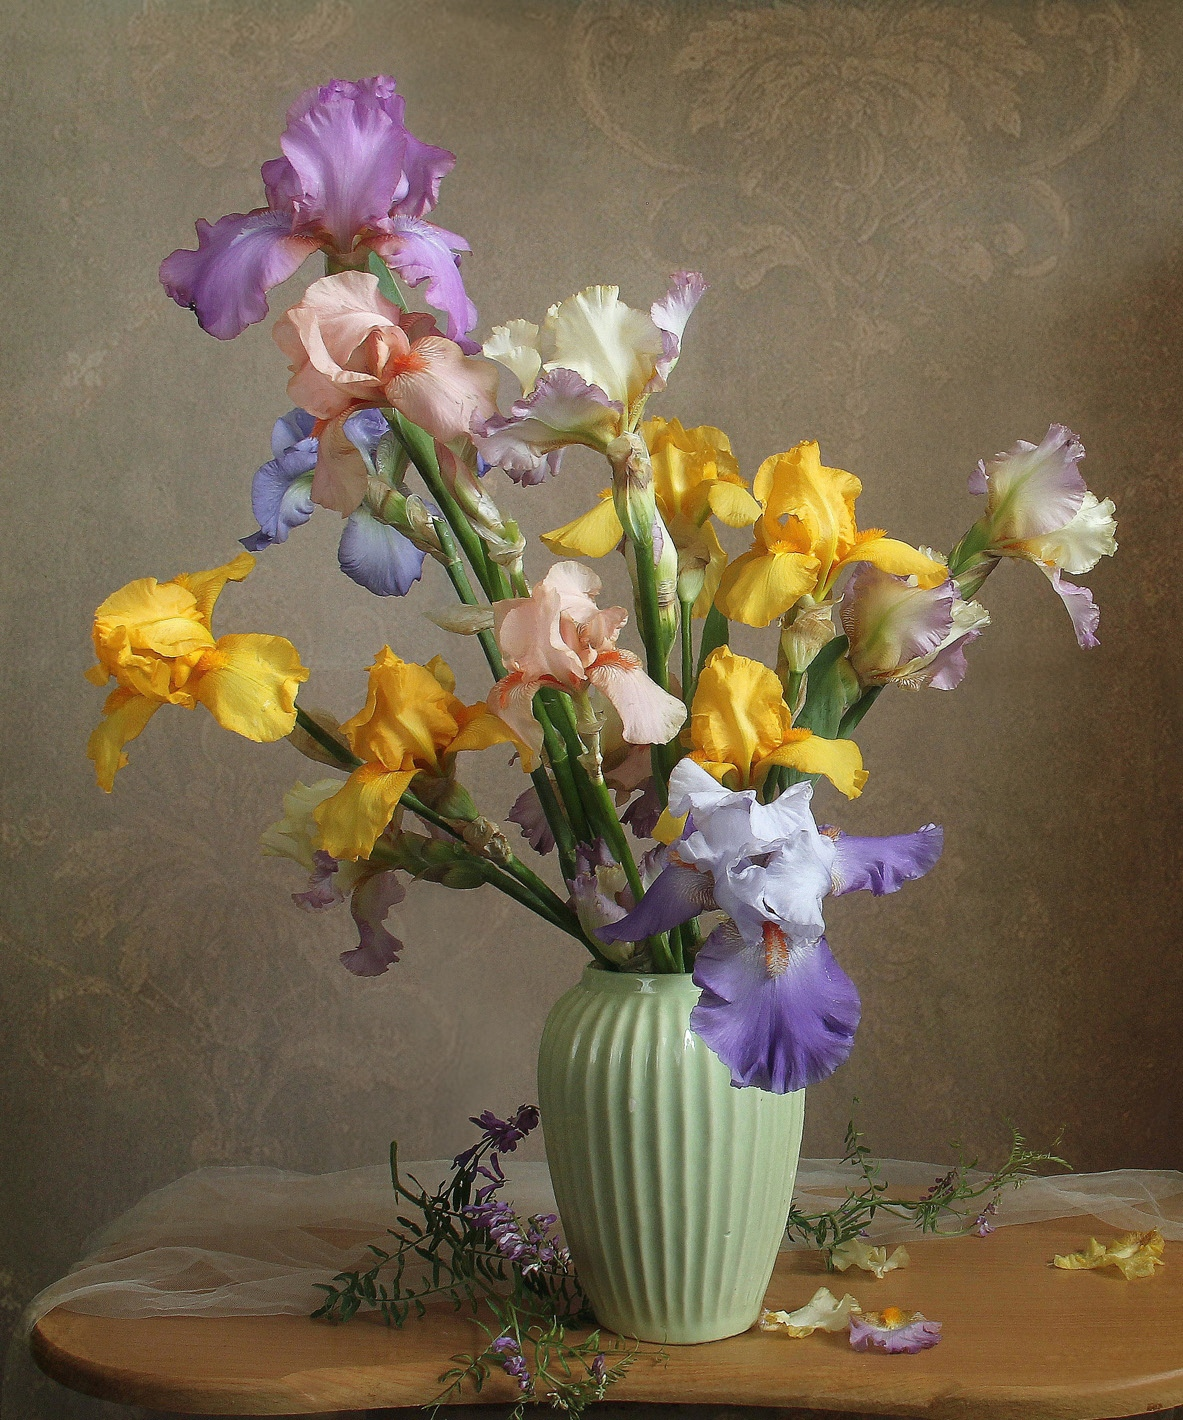 весна, натюрморт, букет цветов,ирисы, марина филатова, Филатова Марина